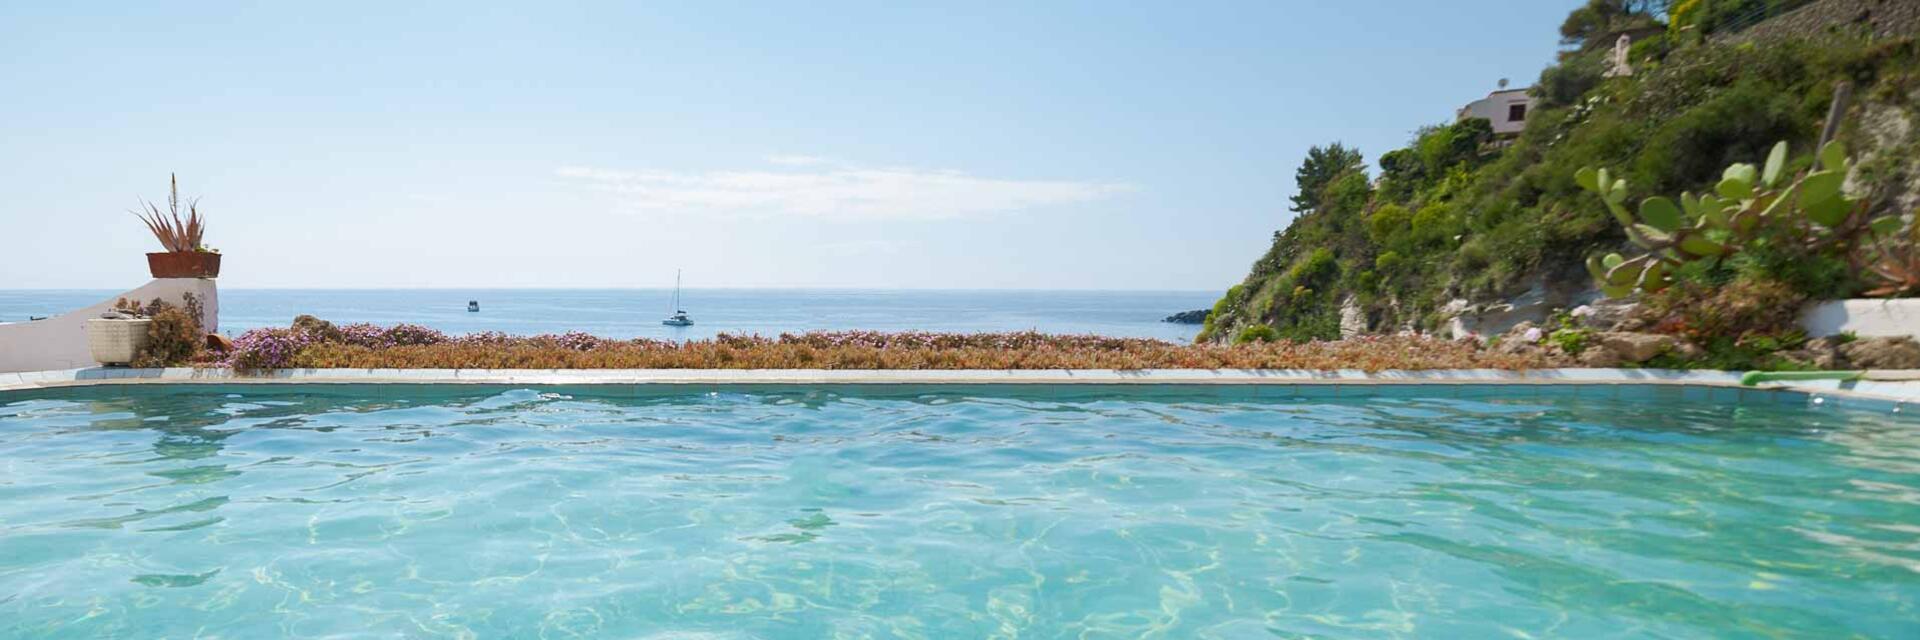 hotelcasarosaterme it piscina 002